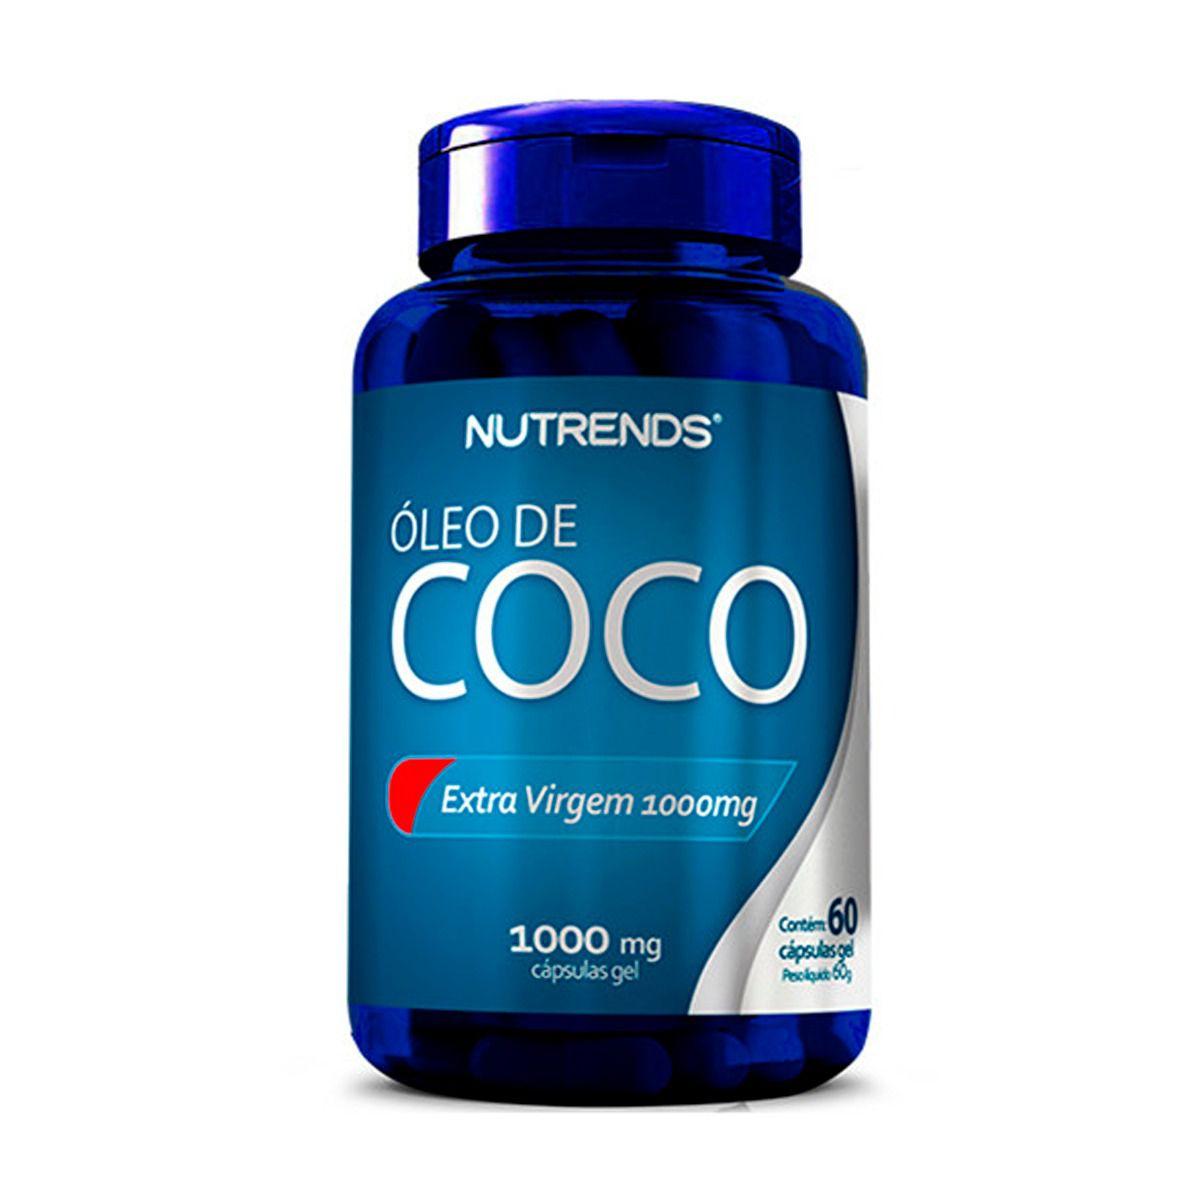 Óleo de Coco 1000mg 60 cápsulas - Nutrends